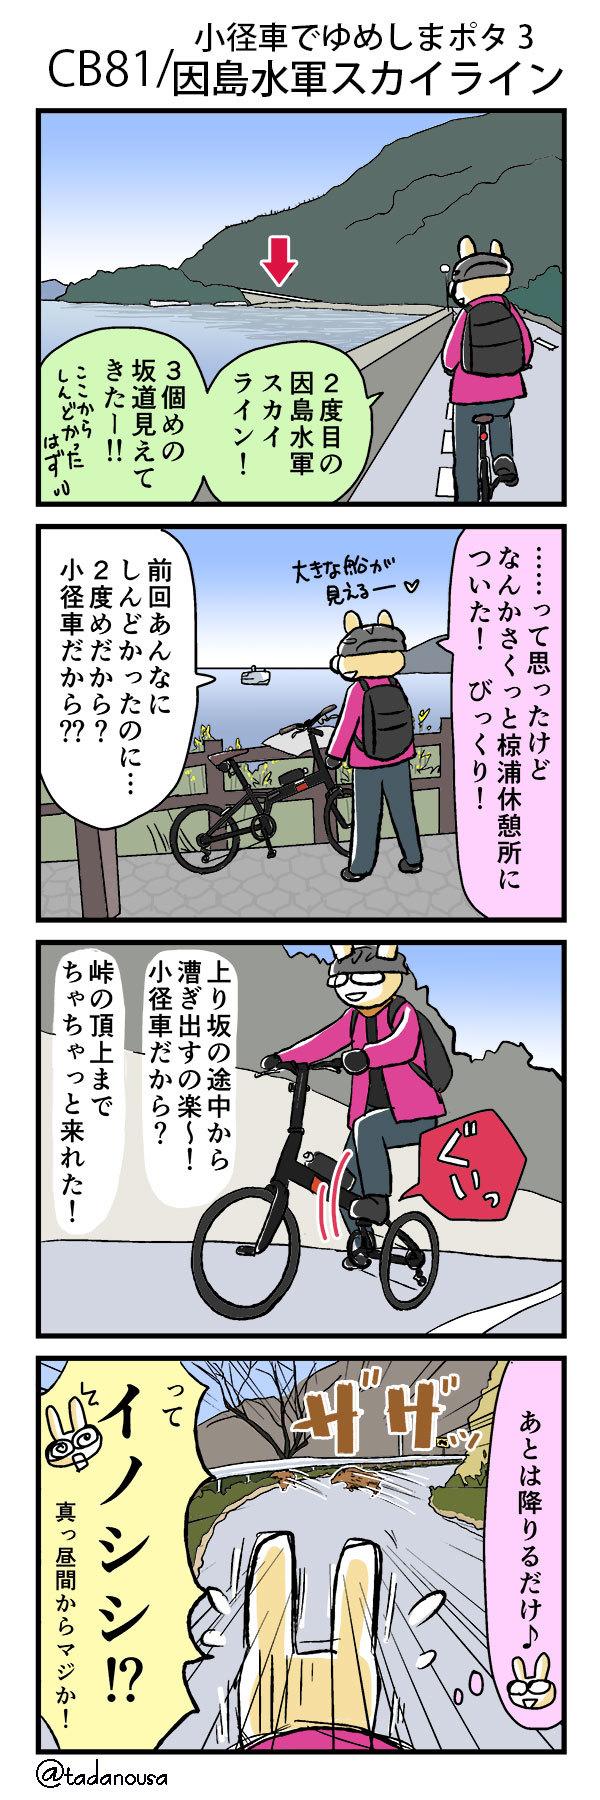 bike_4koma_kako121_s.jpg